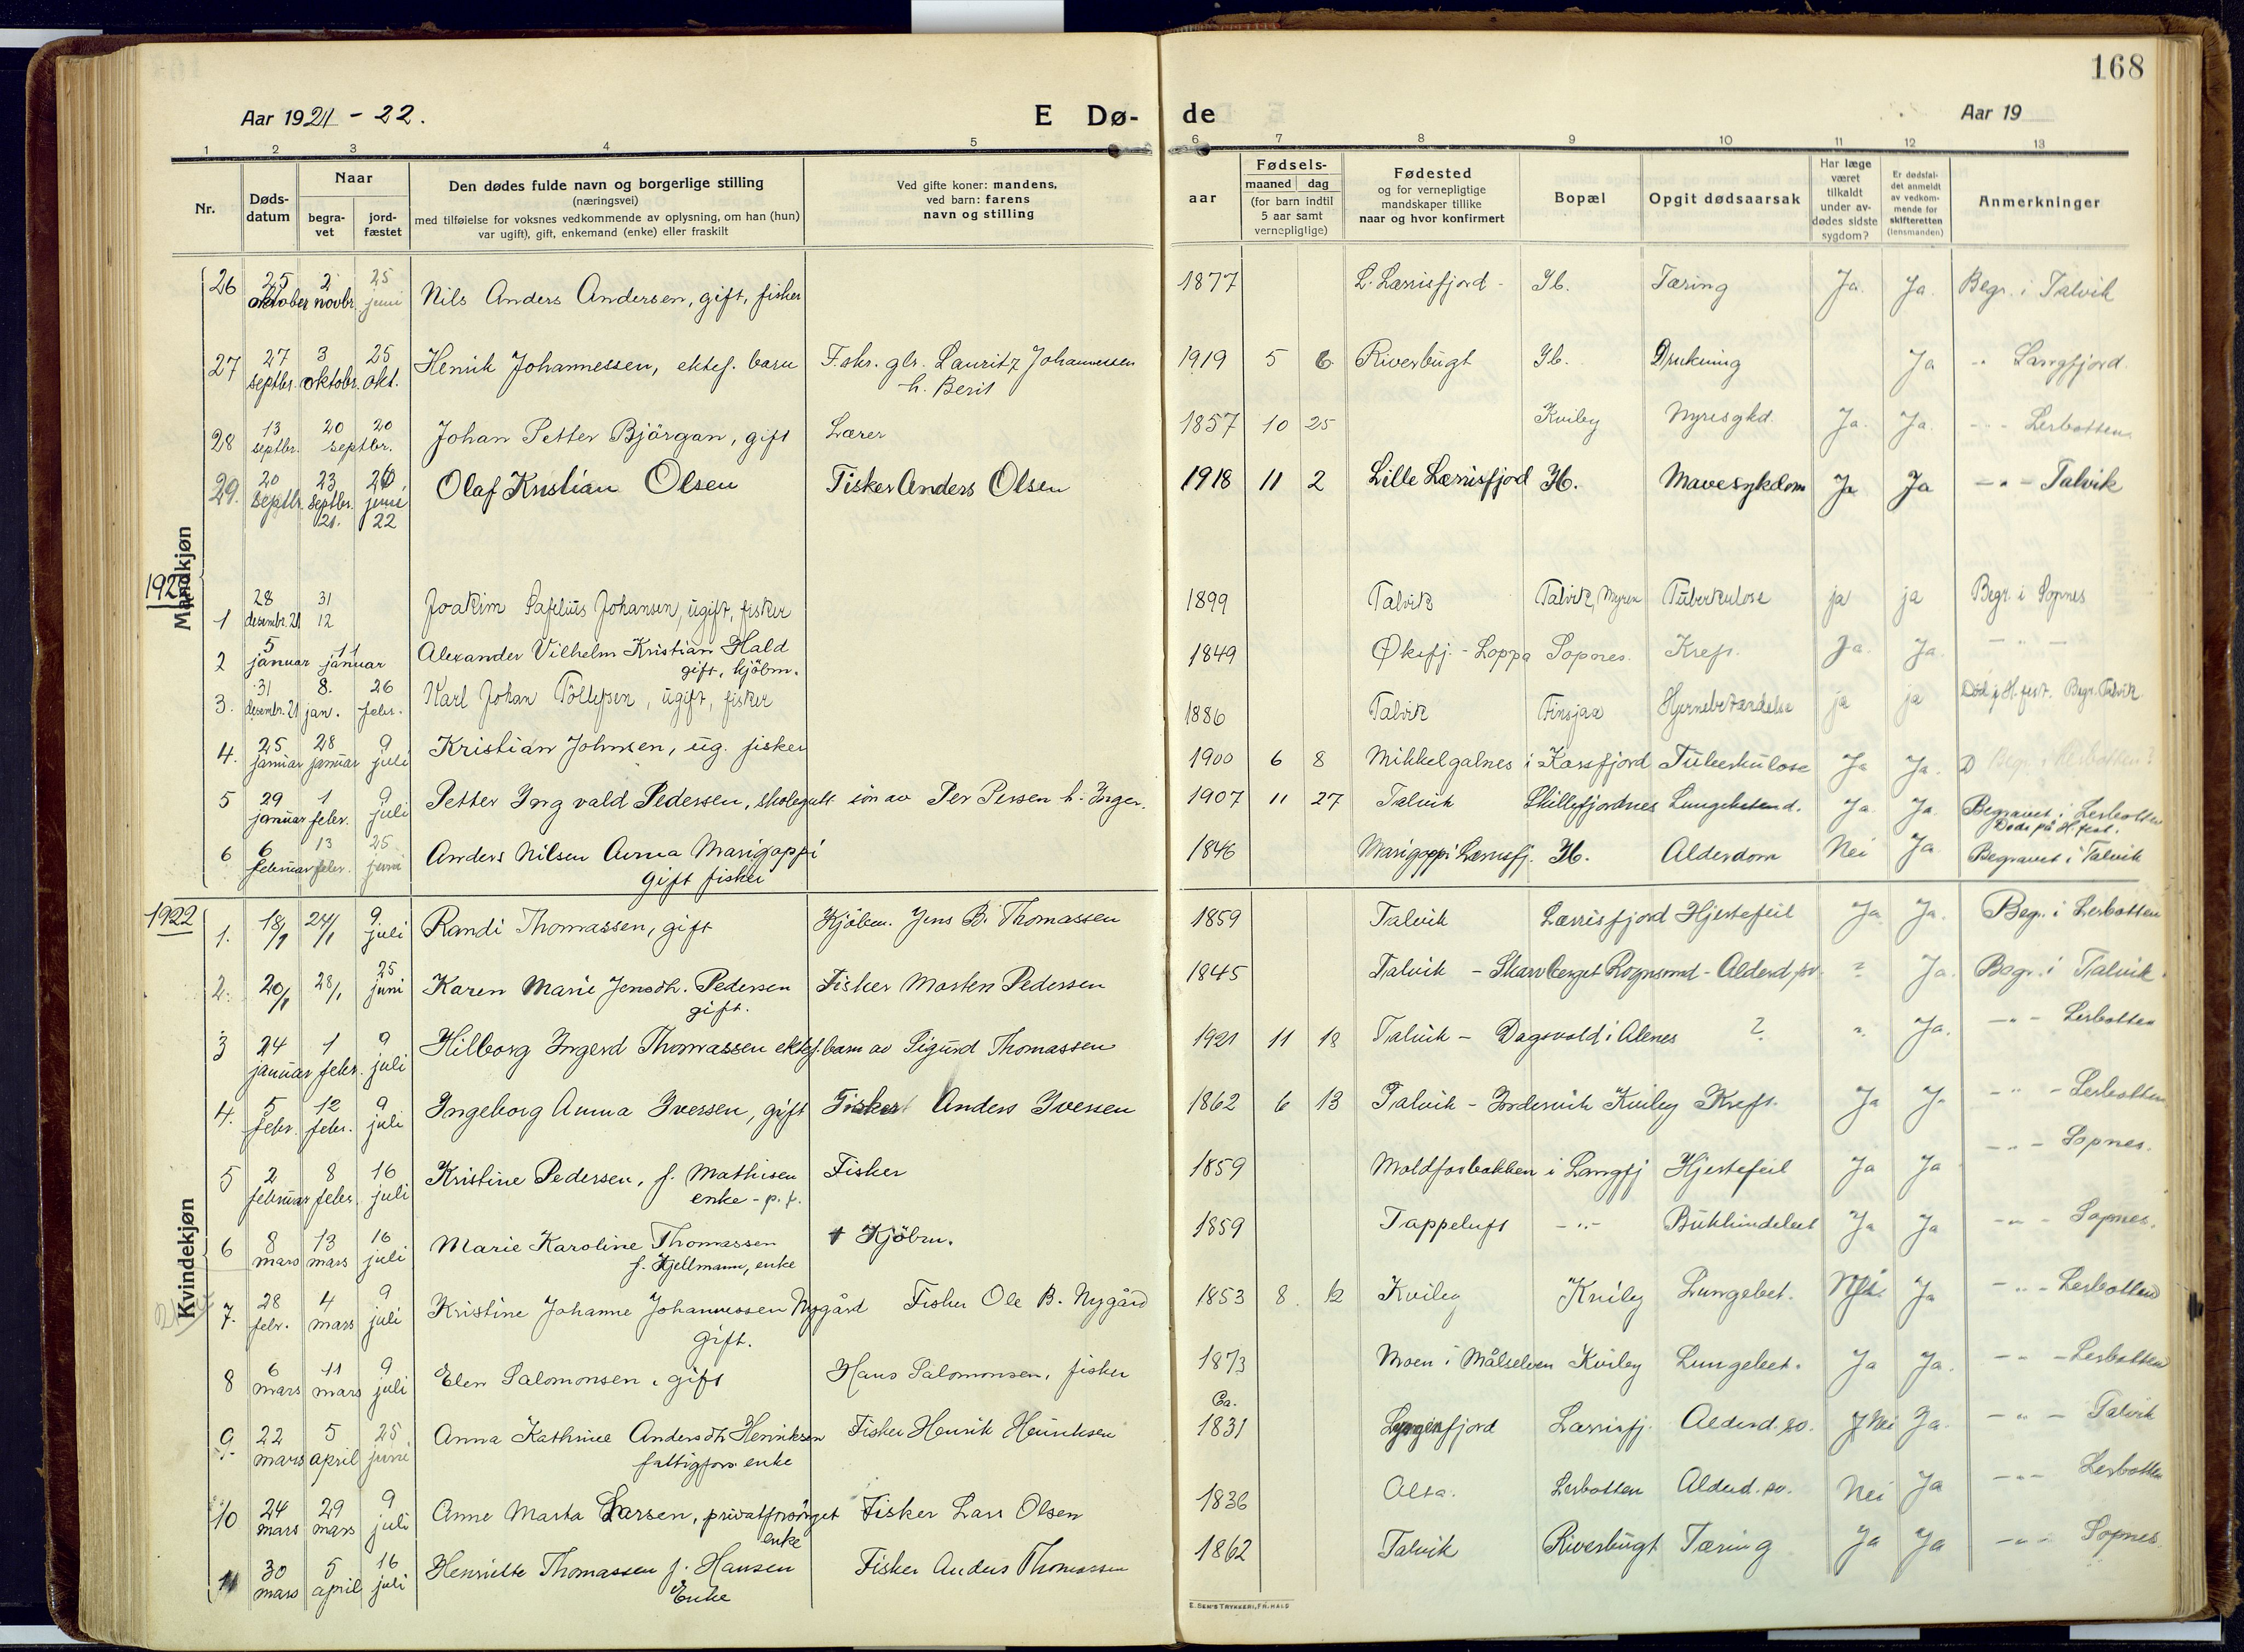 SATØ, Talvik sokneprestkontor, H/Ha/L0018kirke: Ministerialbok nr. 18, 1915-1924, s. 168